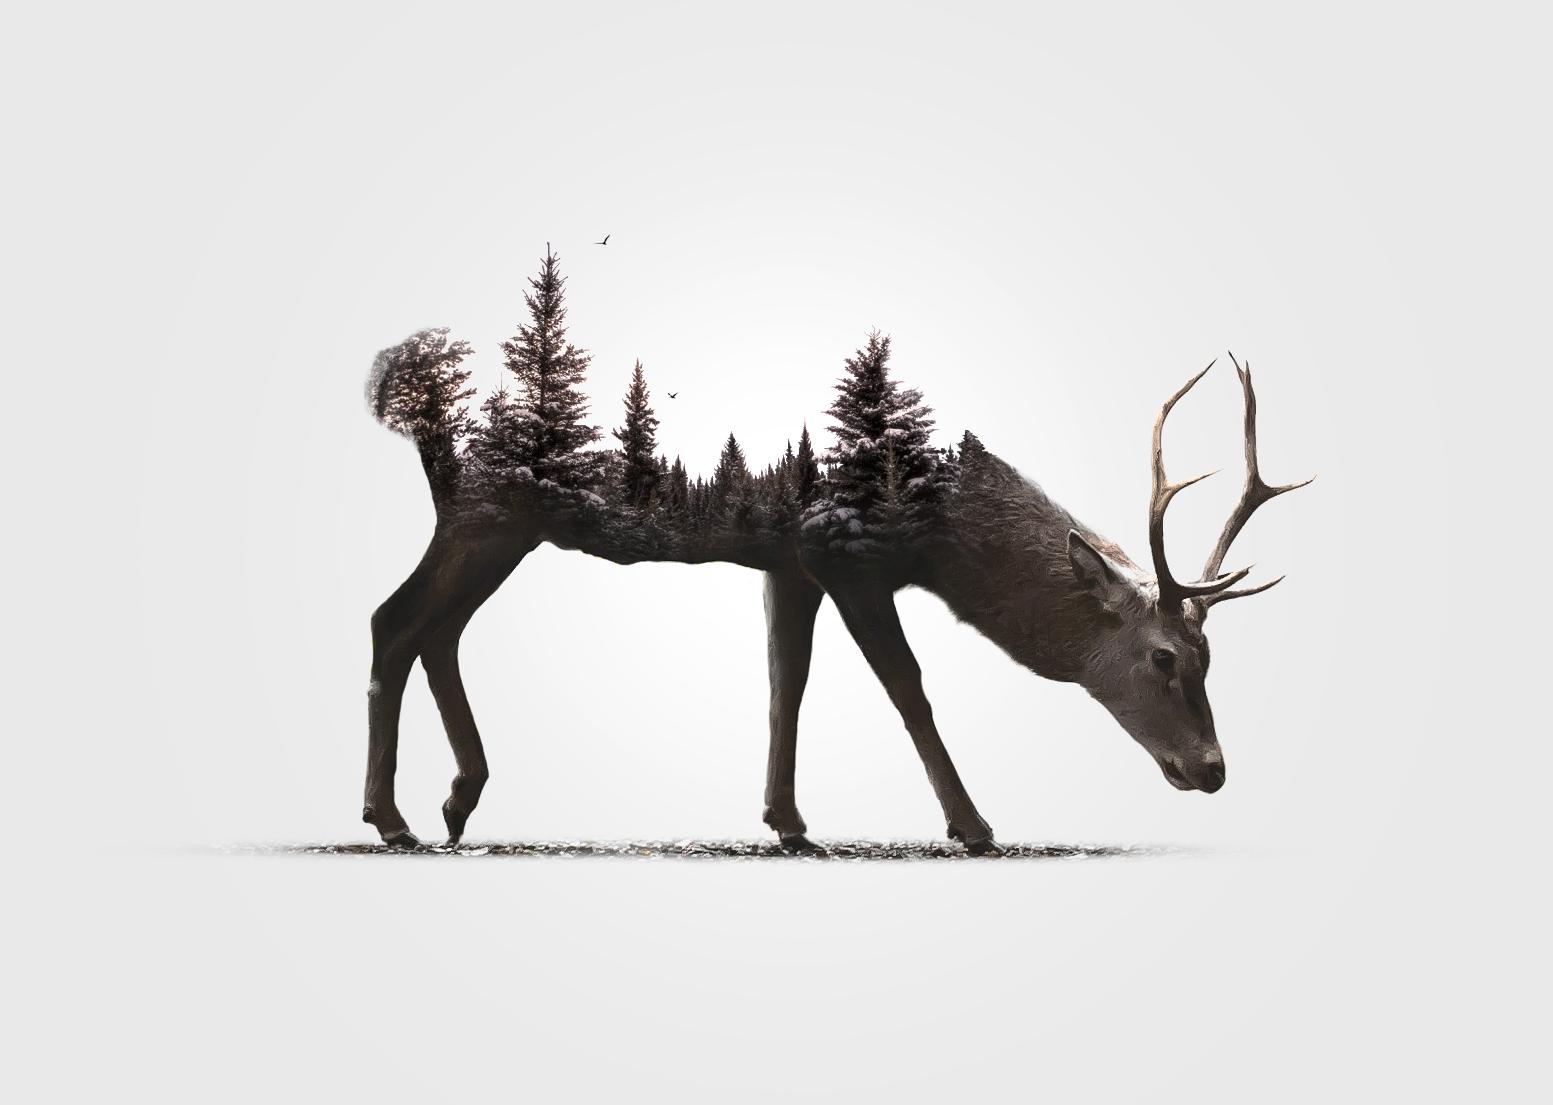 General 1553x1105 digital art animals simple background